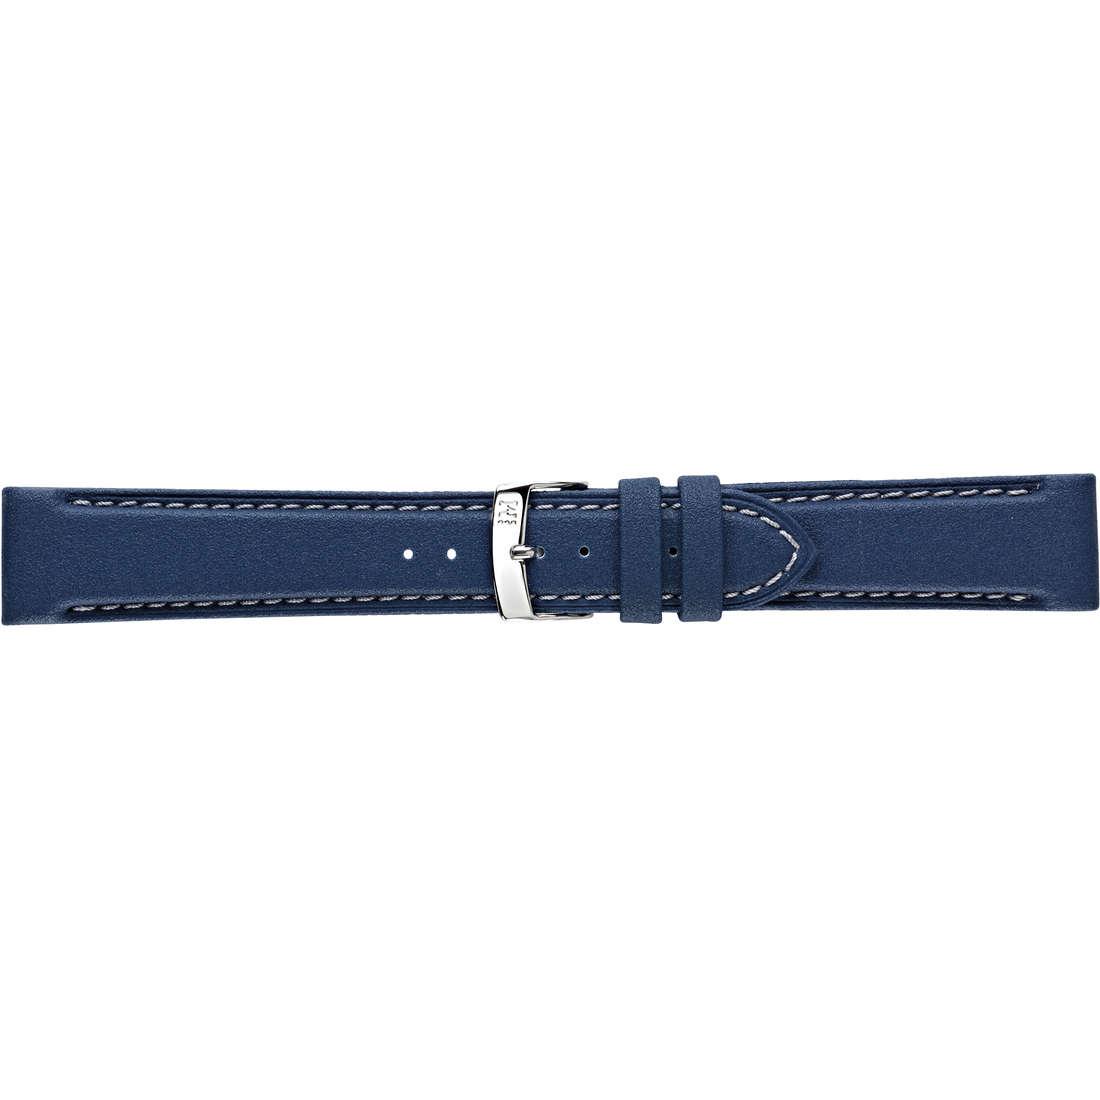 montre bande de montres homme Morellato Linea Sport A01U3822A42062CR22